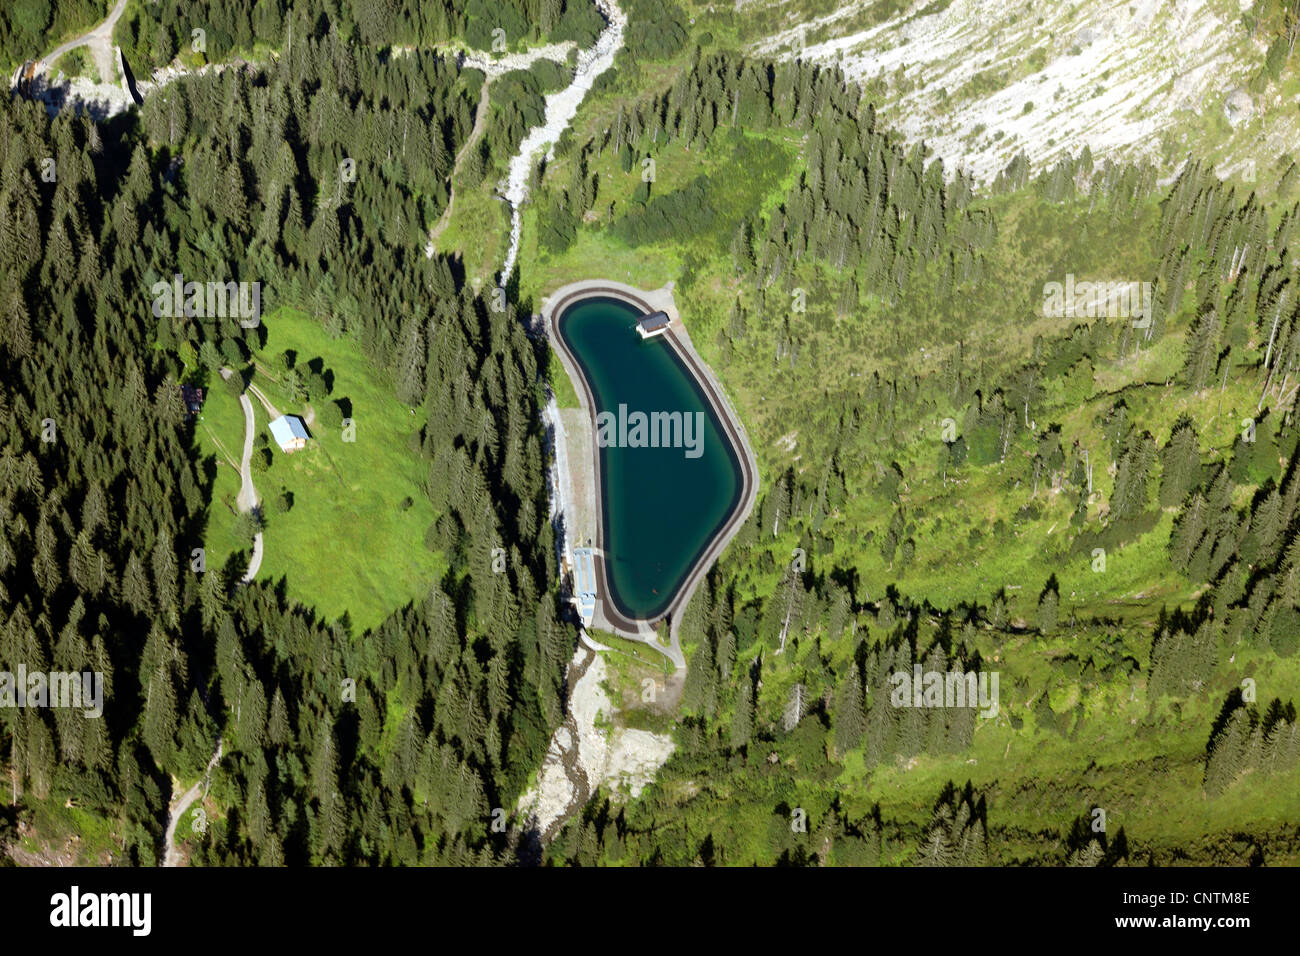 lake for snow producing in the Alps, Germany, Bavaria, Allgaeuer Alpen, Allgaeu Stock Photo